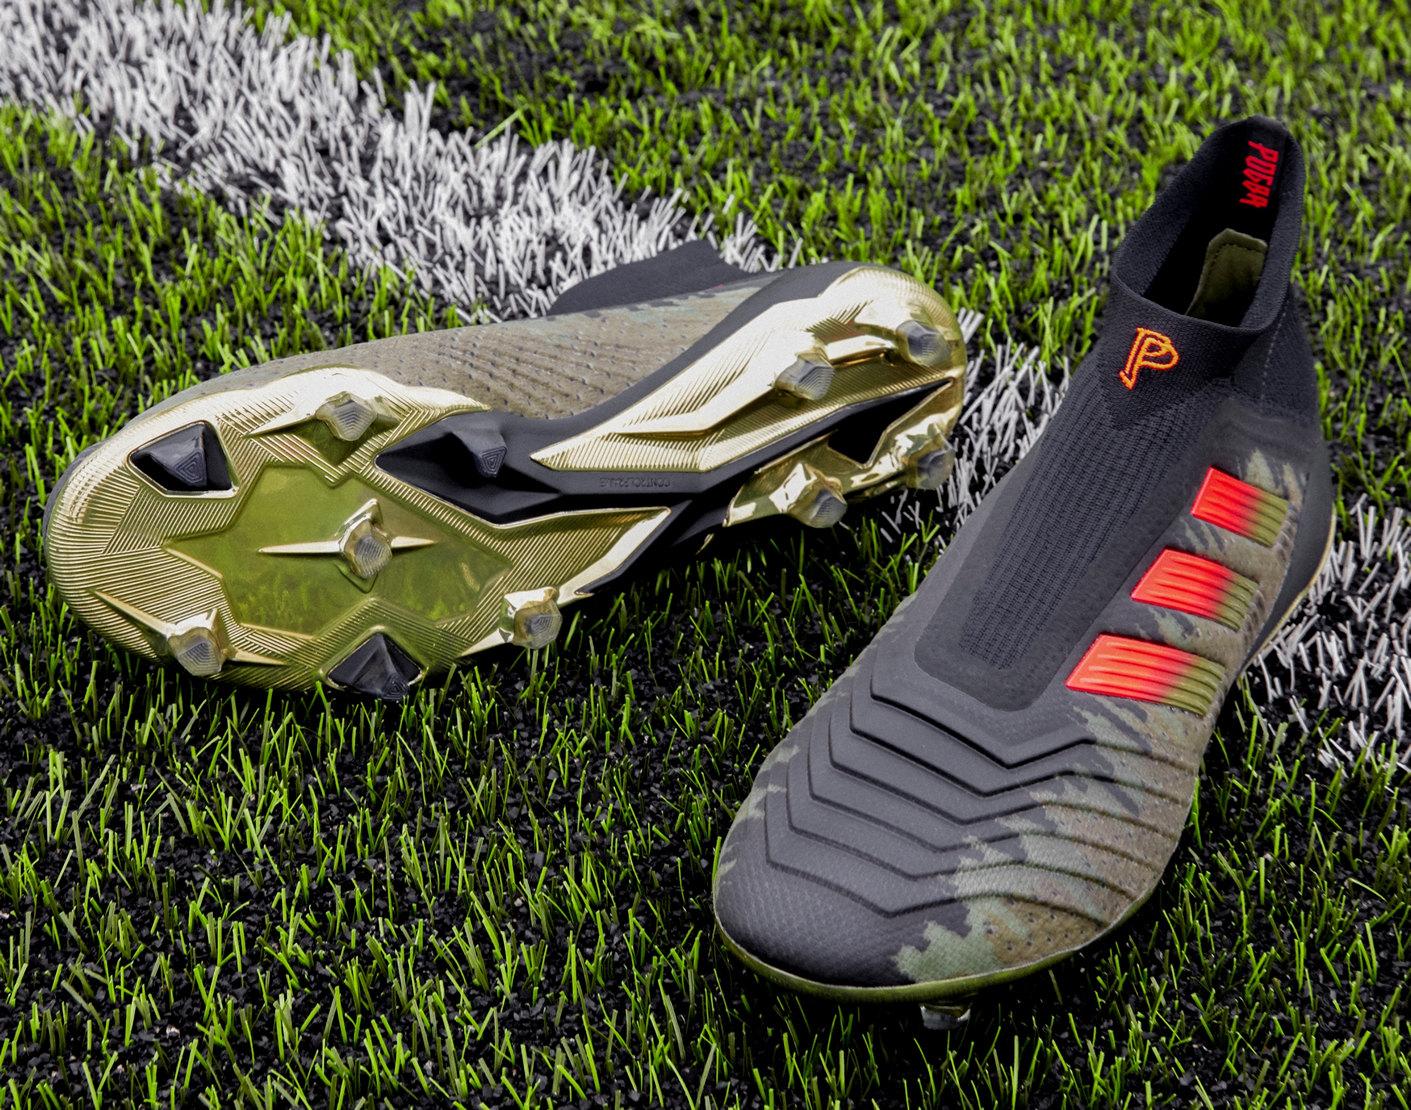 Botines Predator18+ de Paul Pogba 2018/19 | Imagen Adidas